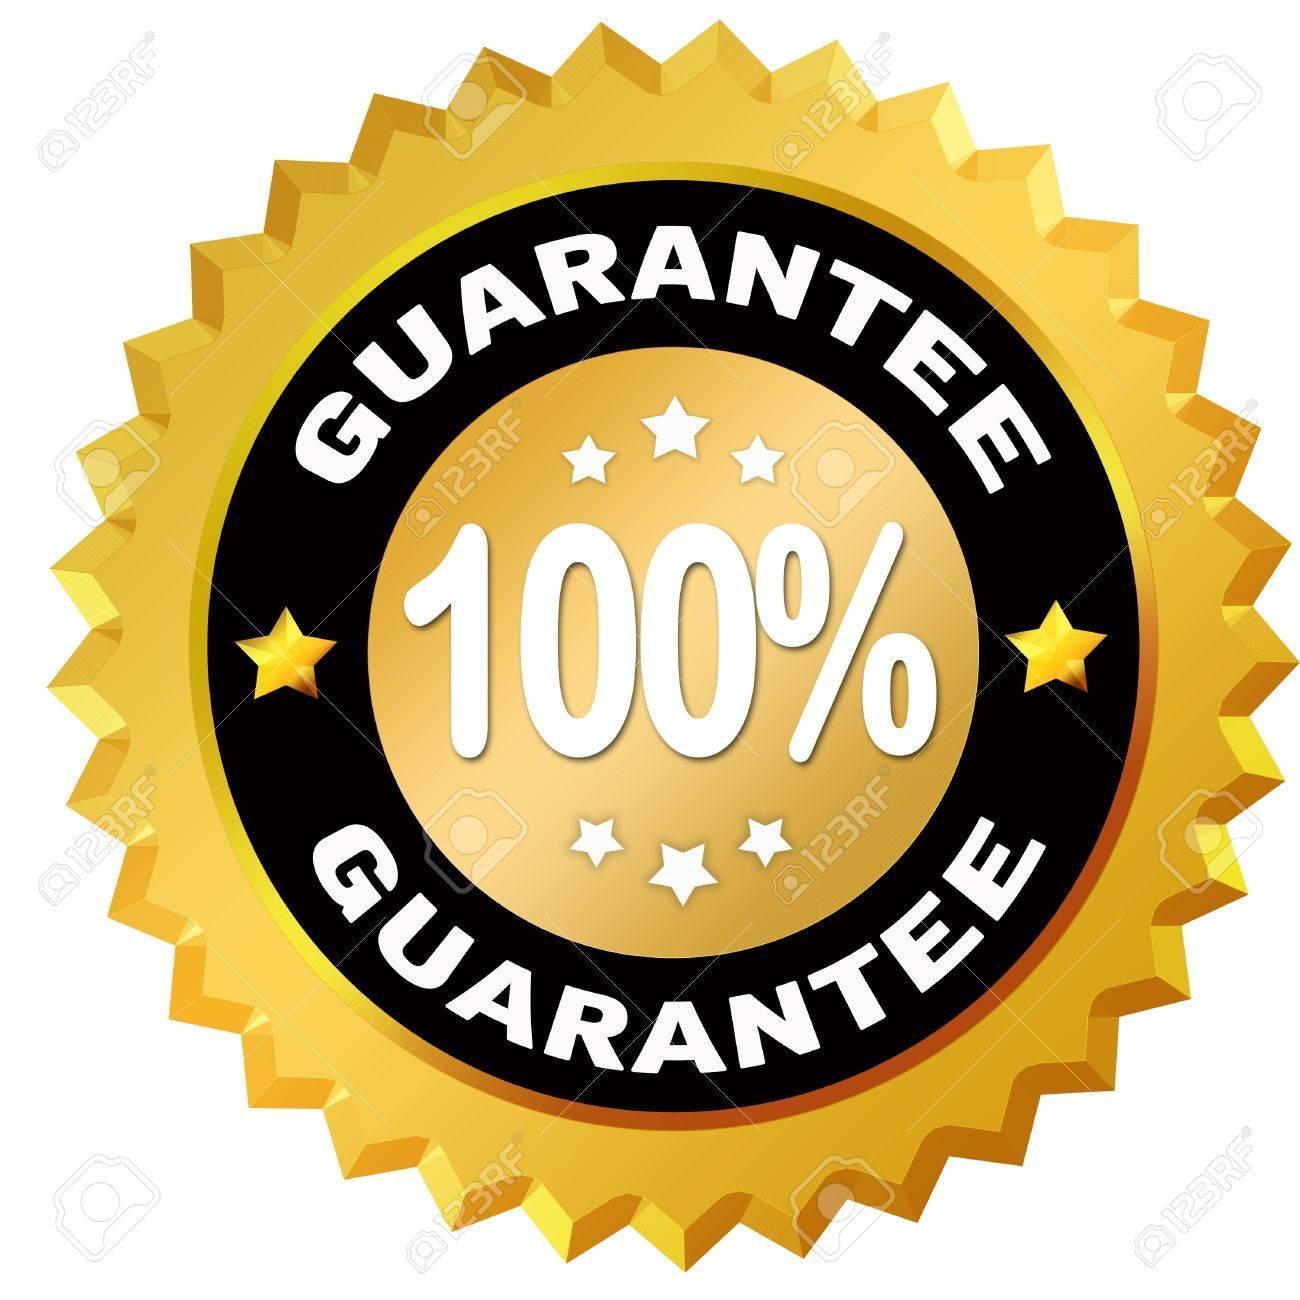 Guarantee label Stock Photo - 11698011